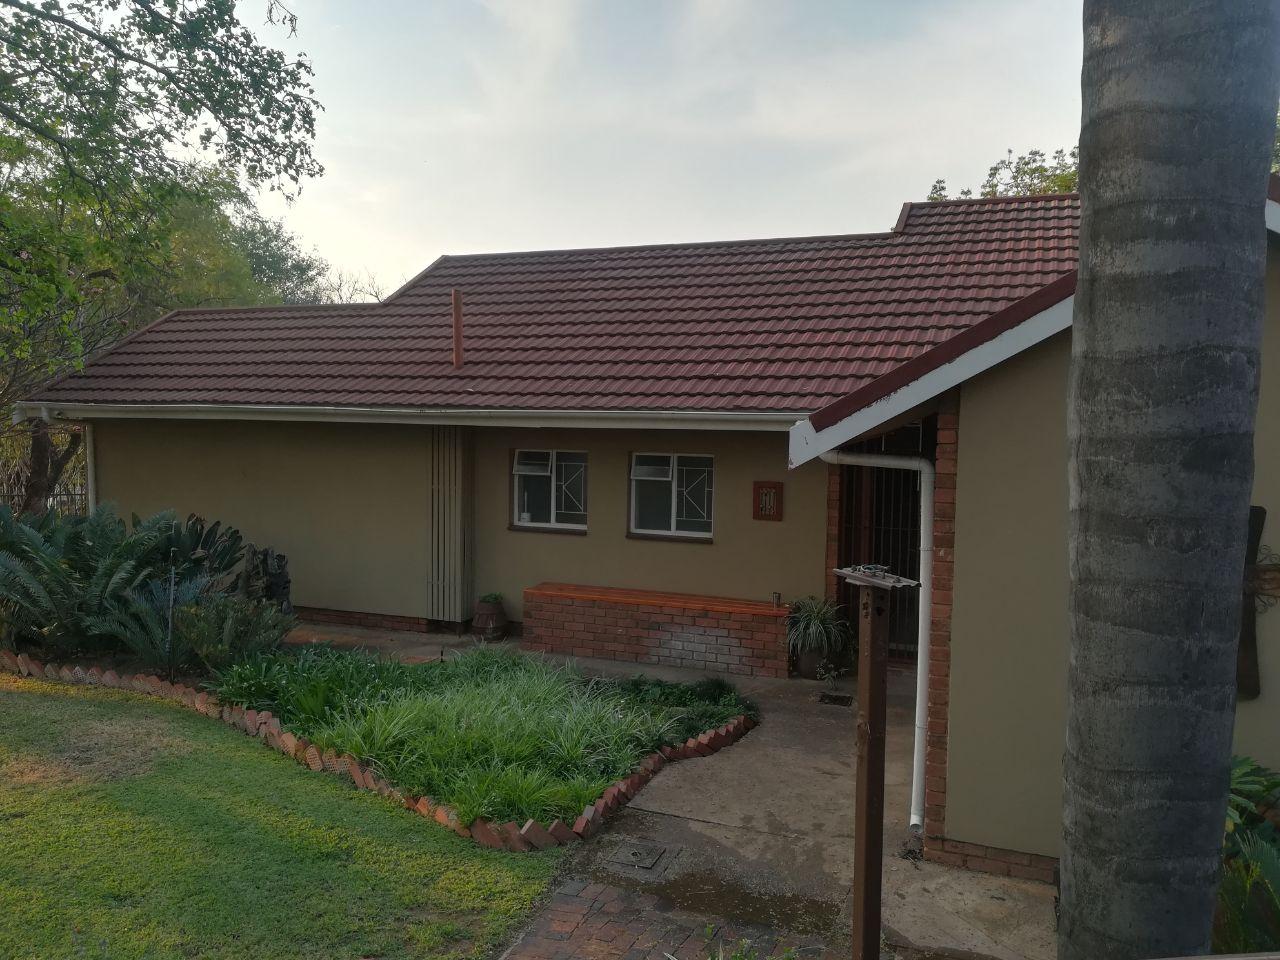 3 BedroomHouse For Sale In Elandsrand